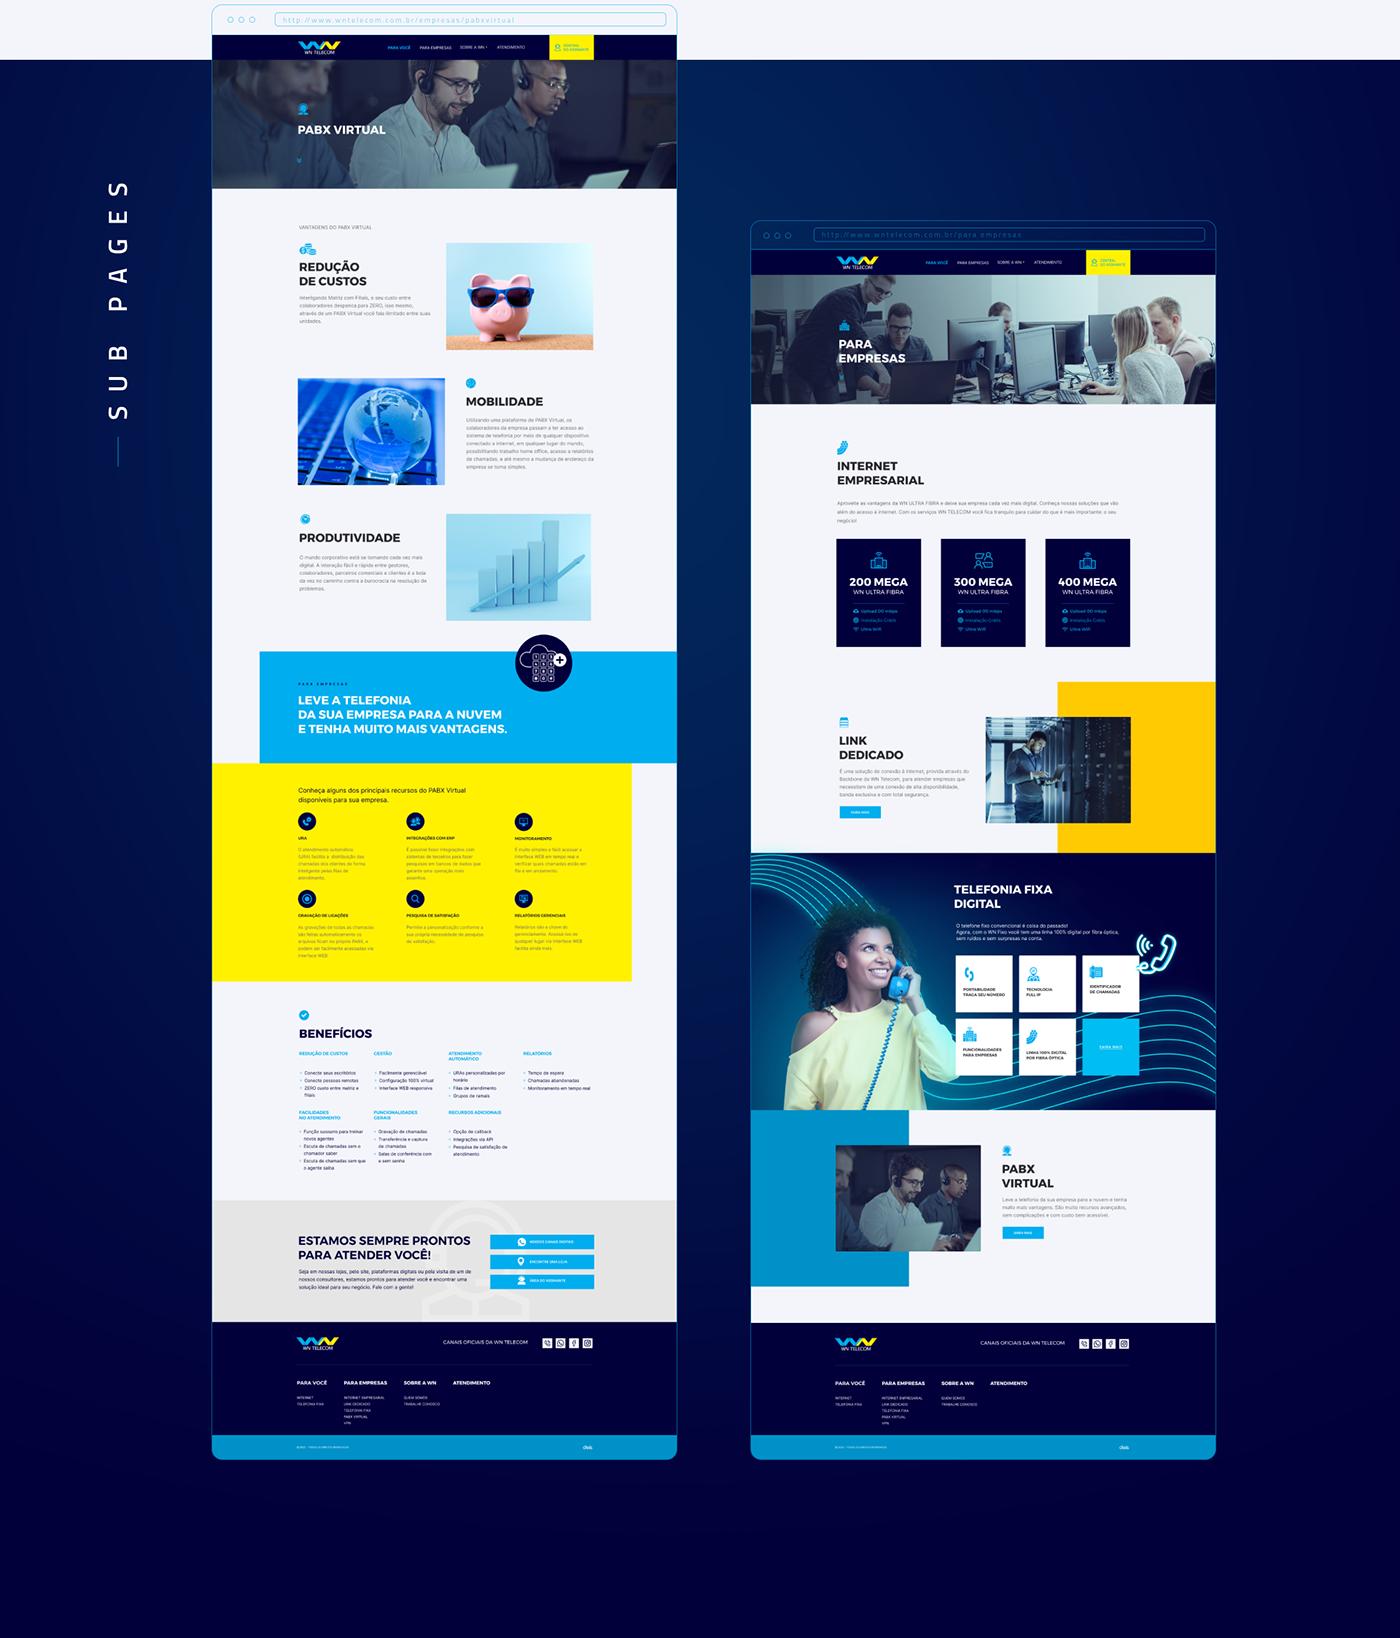 css3 desenvolvimento frontend html5 Responsive ui design UX design Web Webdesign Website